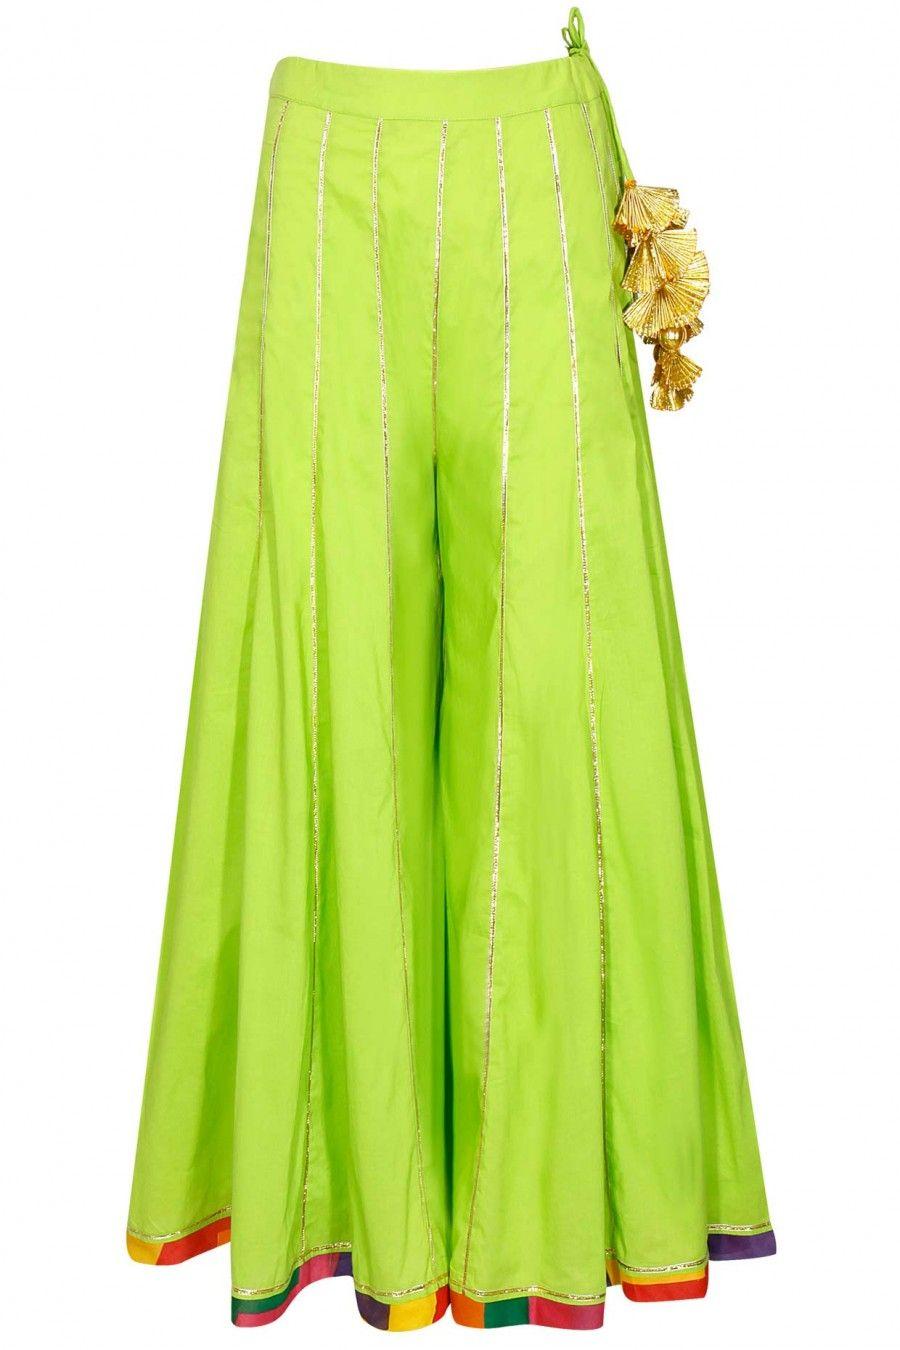 Ayinat By Taniya Oconnor Ethnic Suit Anarkali Jackets Celia Celana Rok Pant Sharara Blouse Designs Dress Pallazo Pants